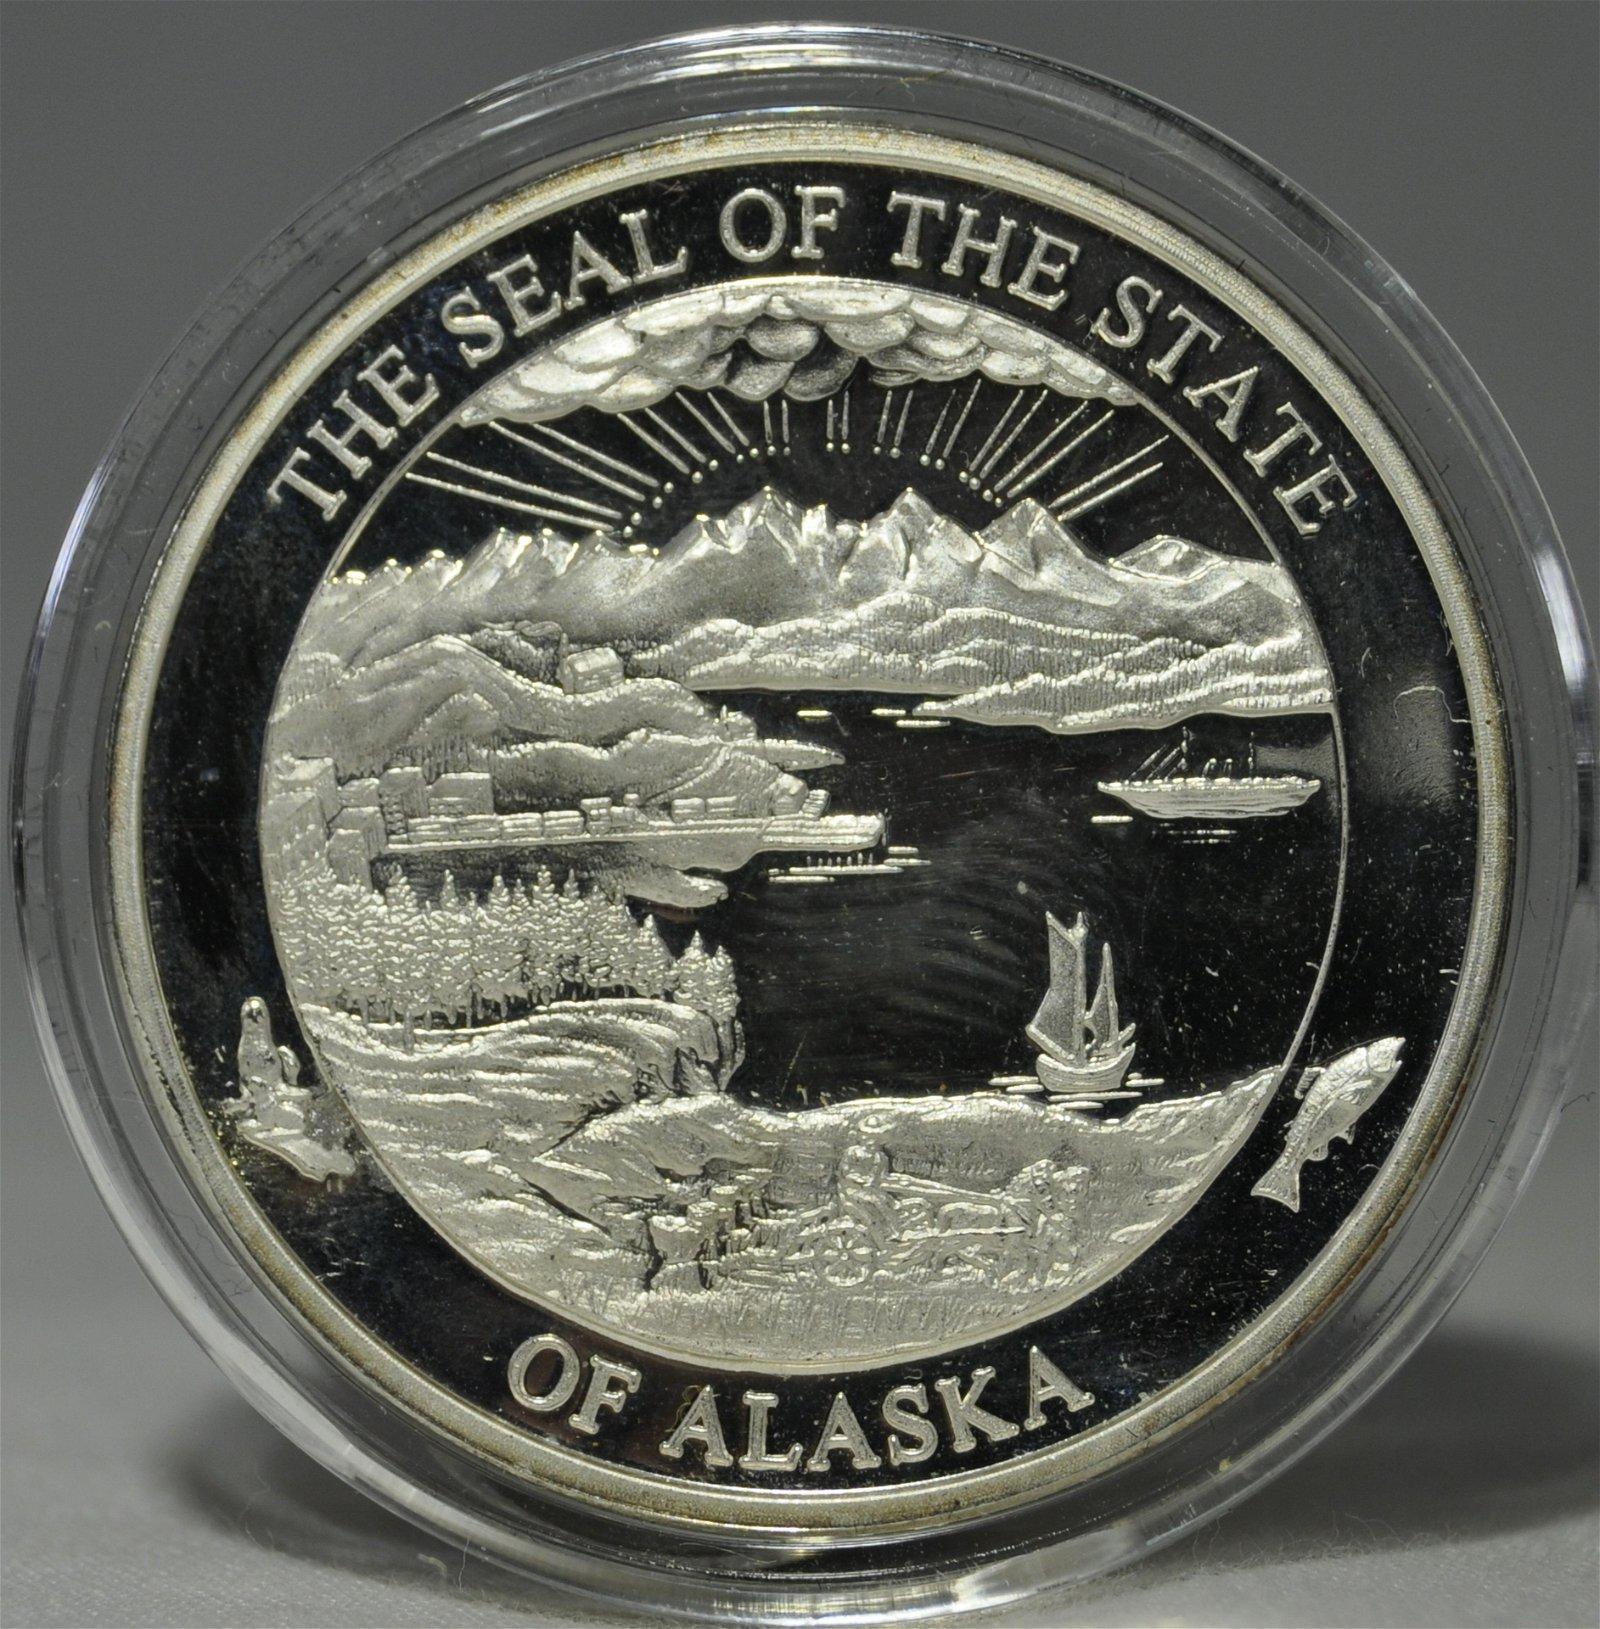 2009 Alaska Mint 1oz 999 Silver Proof Medallion